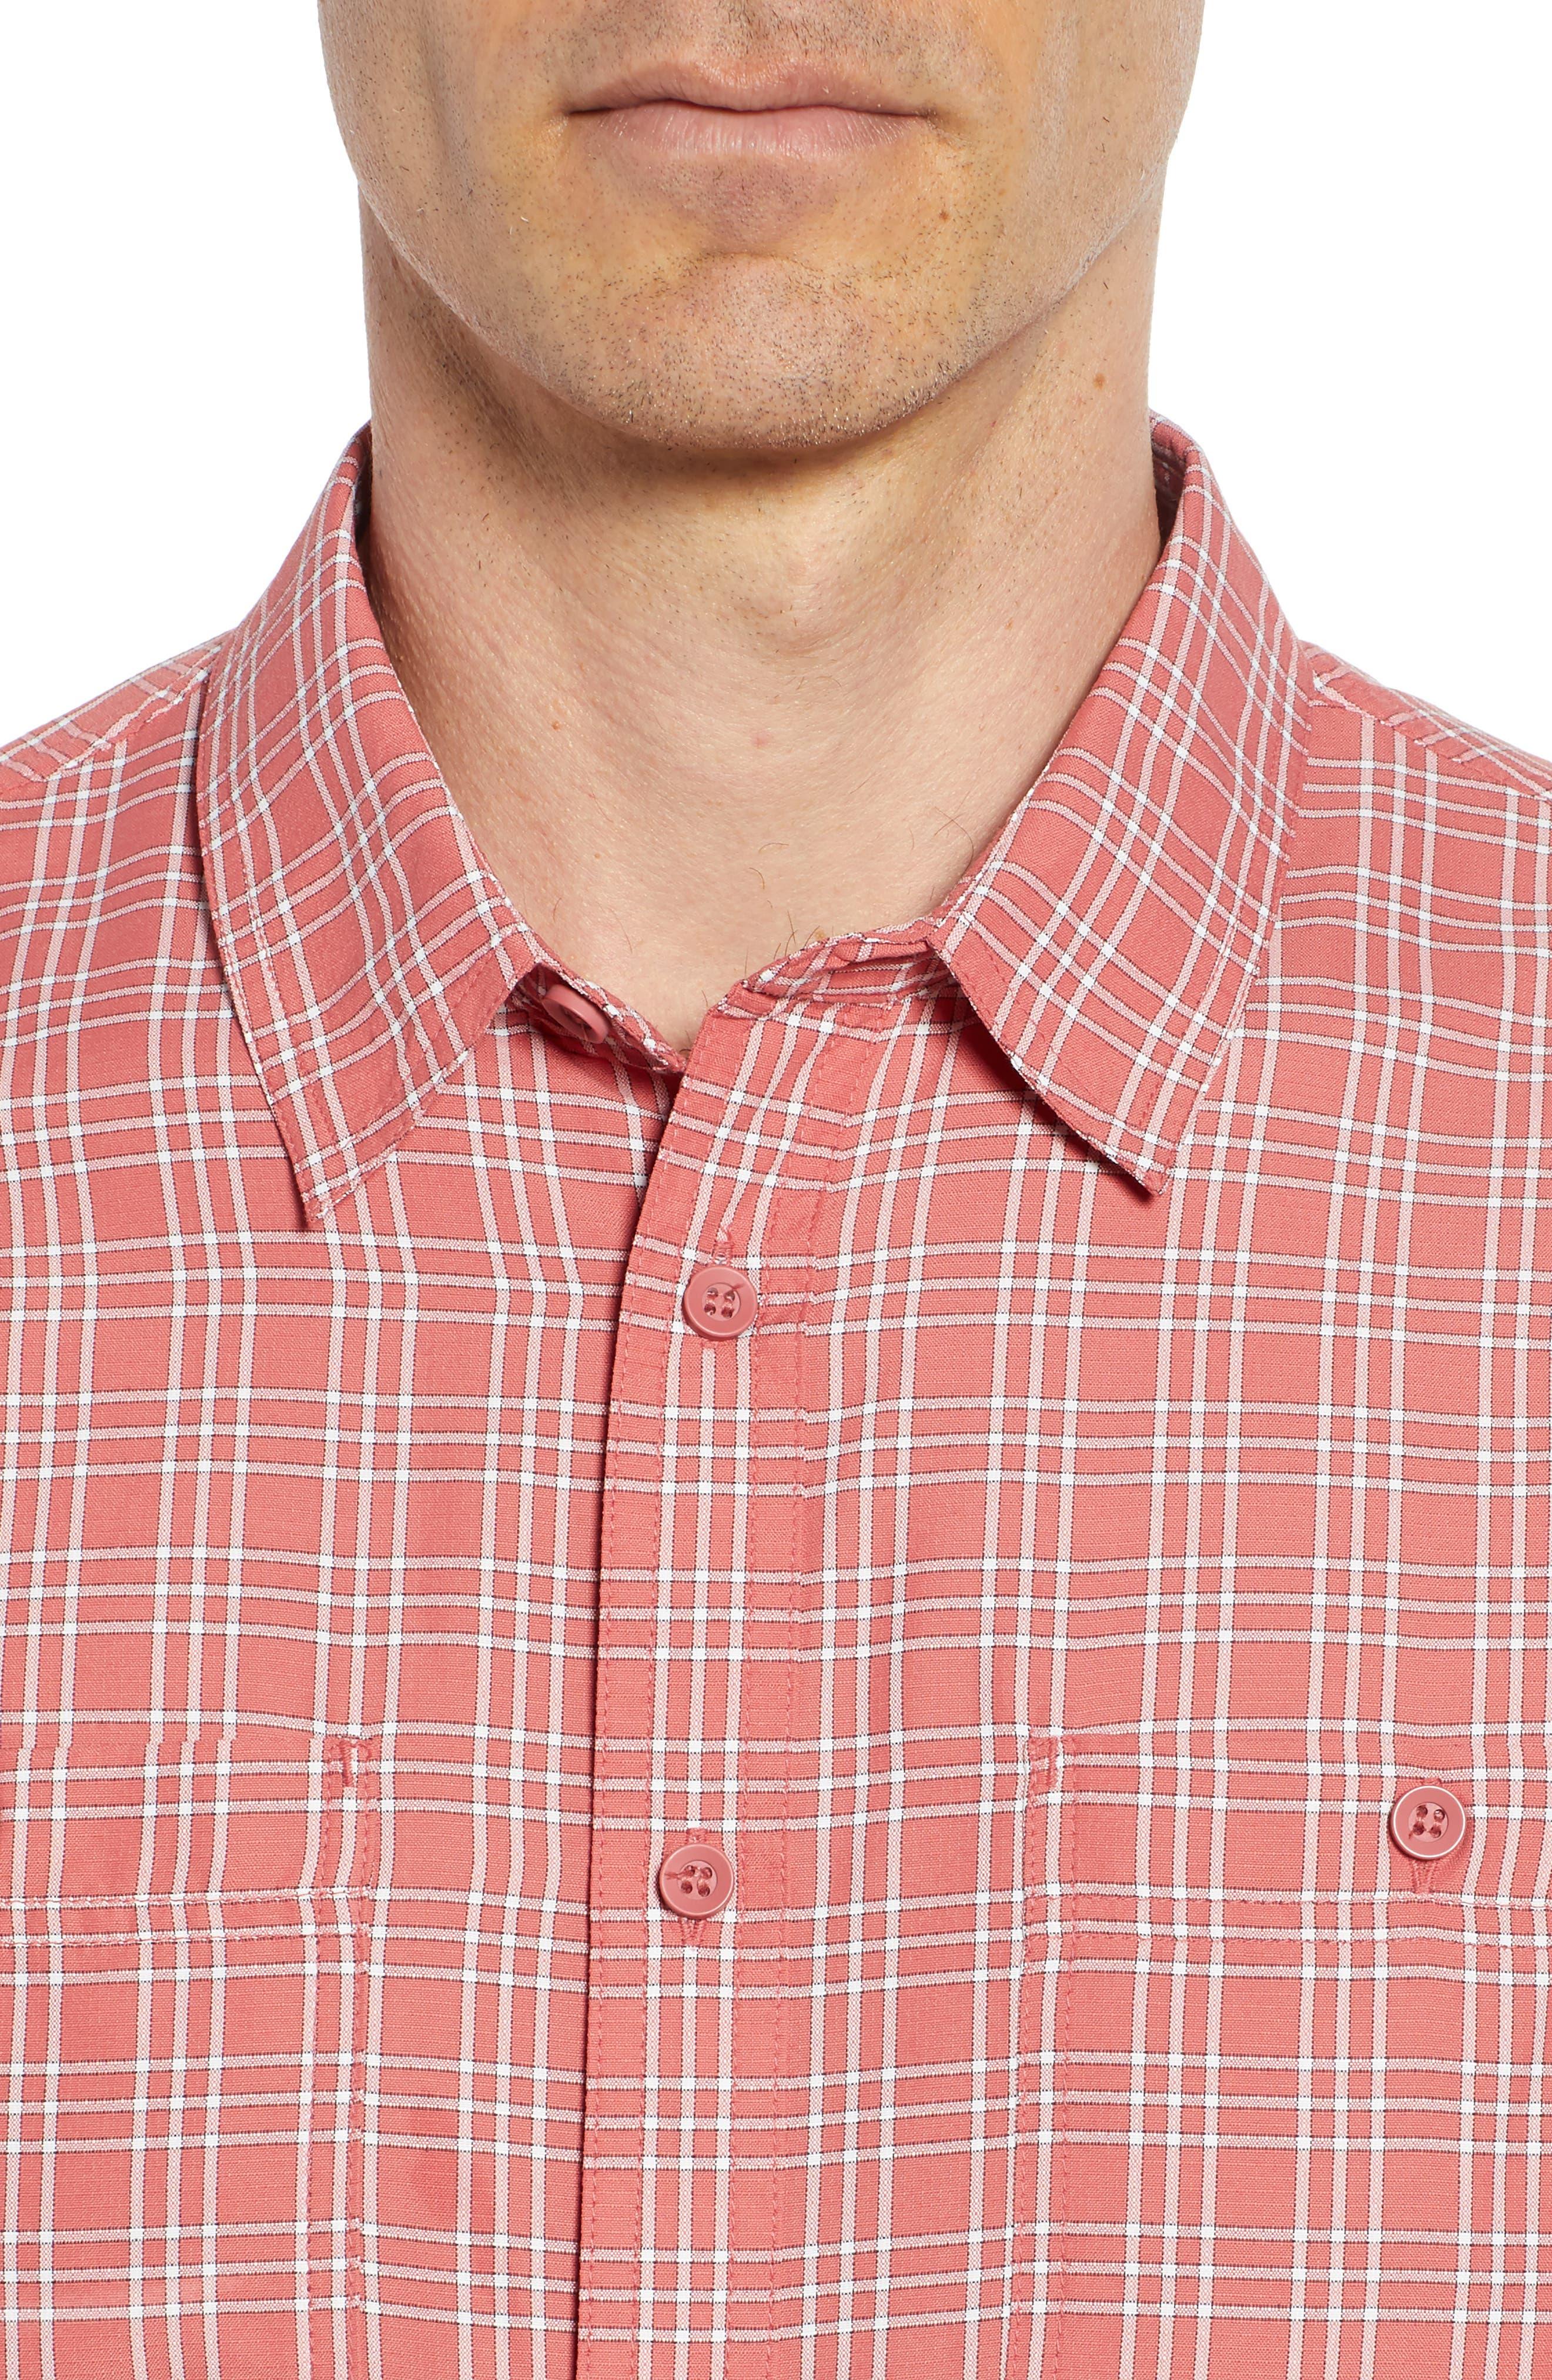 Wake Plaid Regular Fit Performance Sport Shirt,                             Alternate thumbnail 2, color,                             Mineral Red